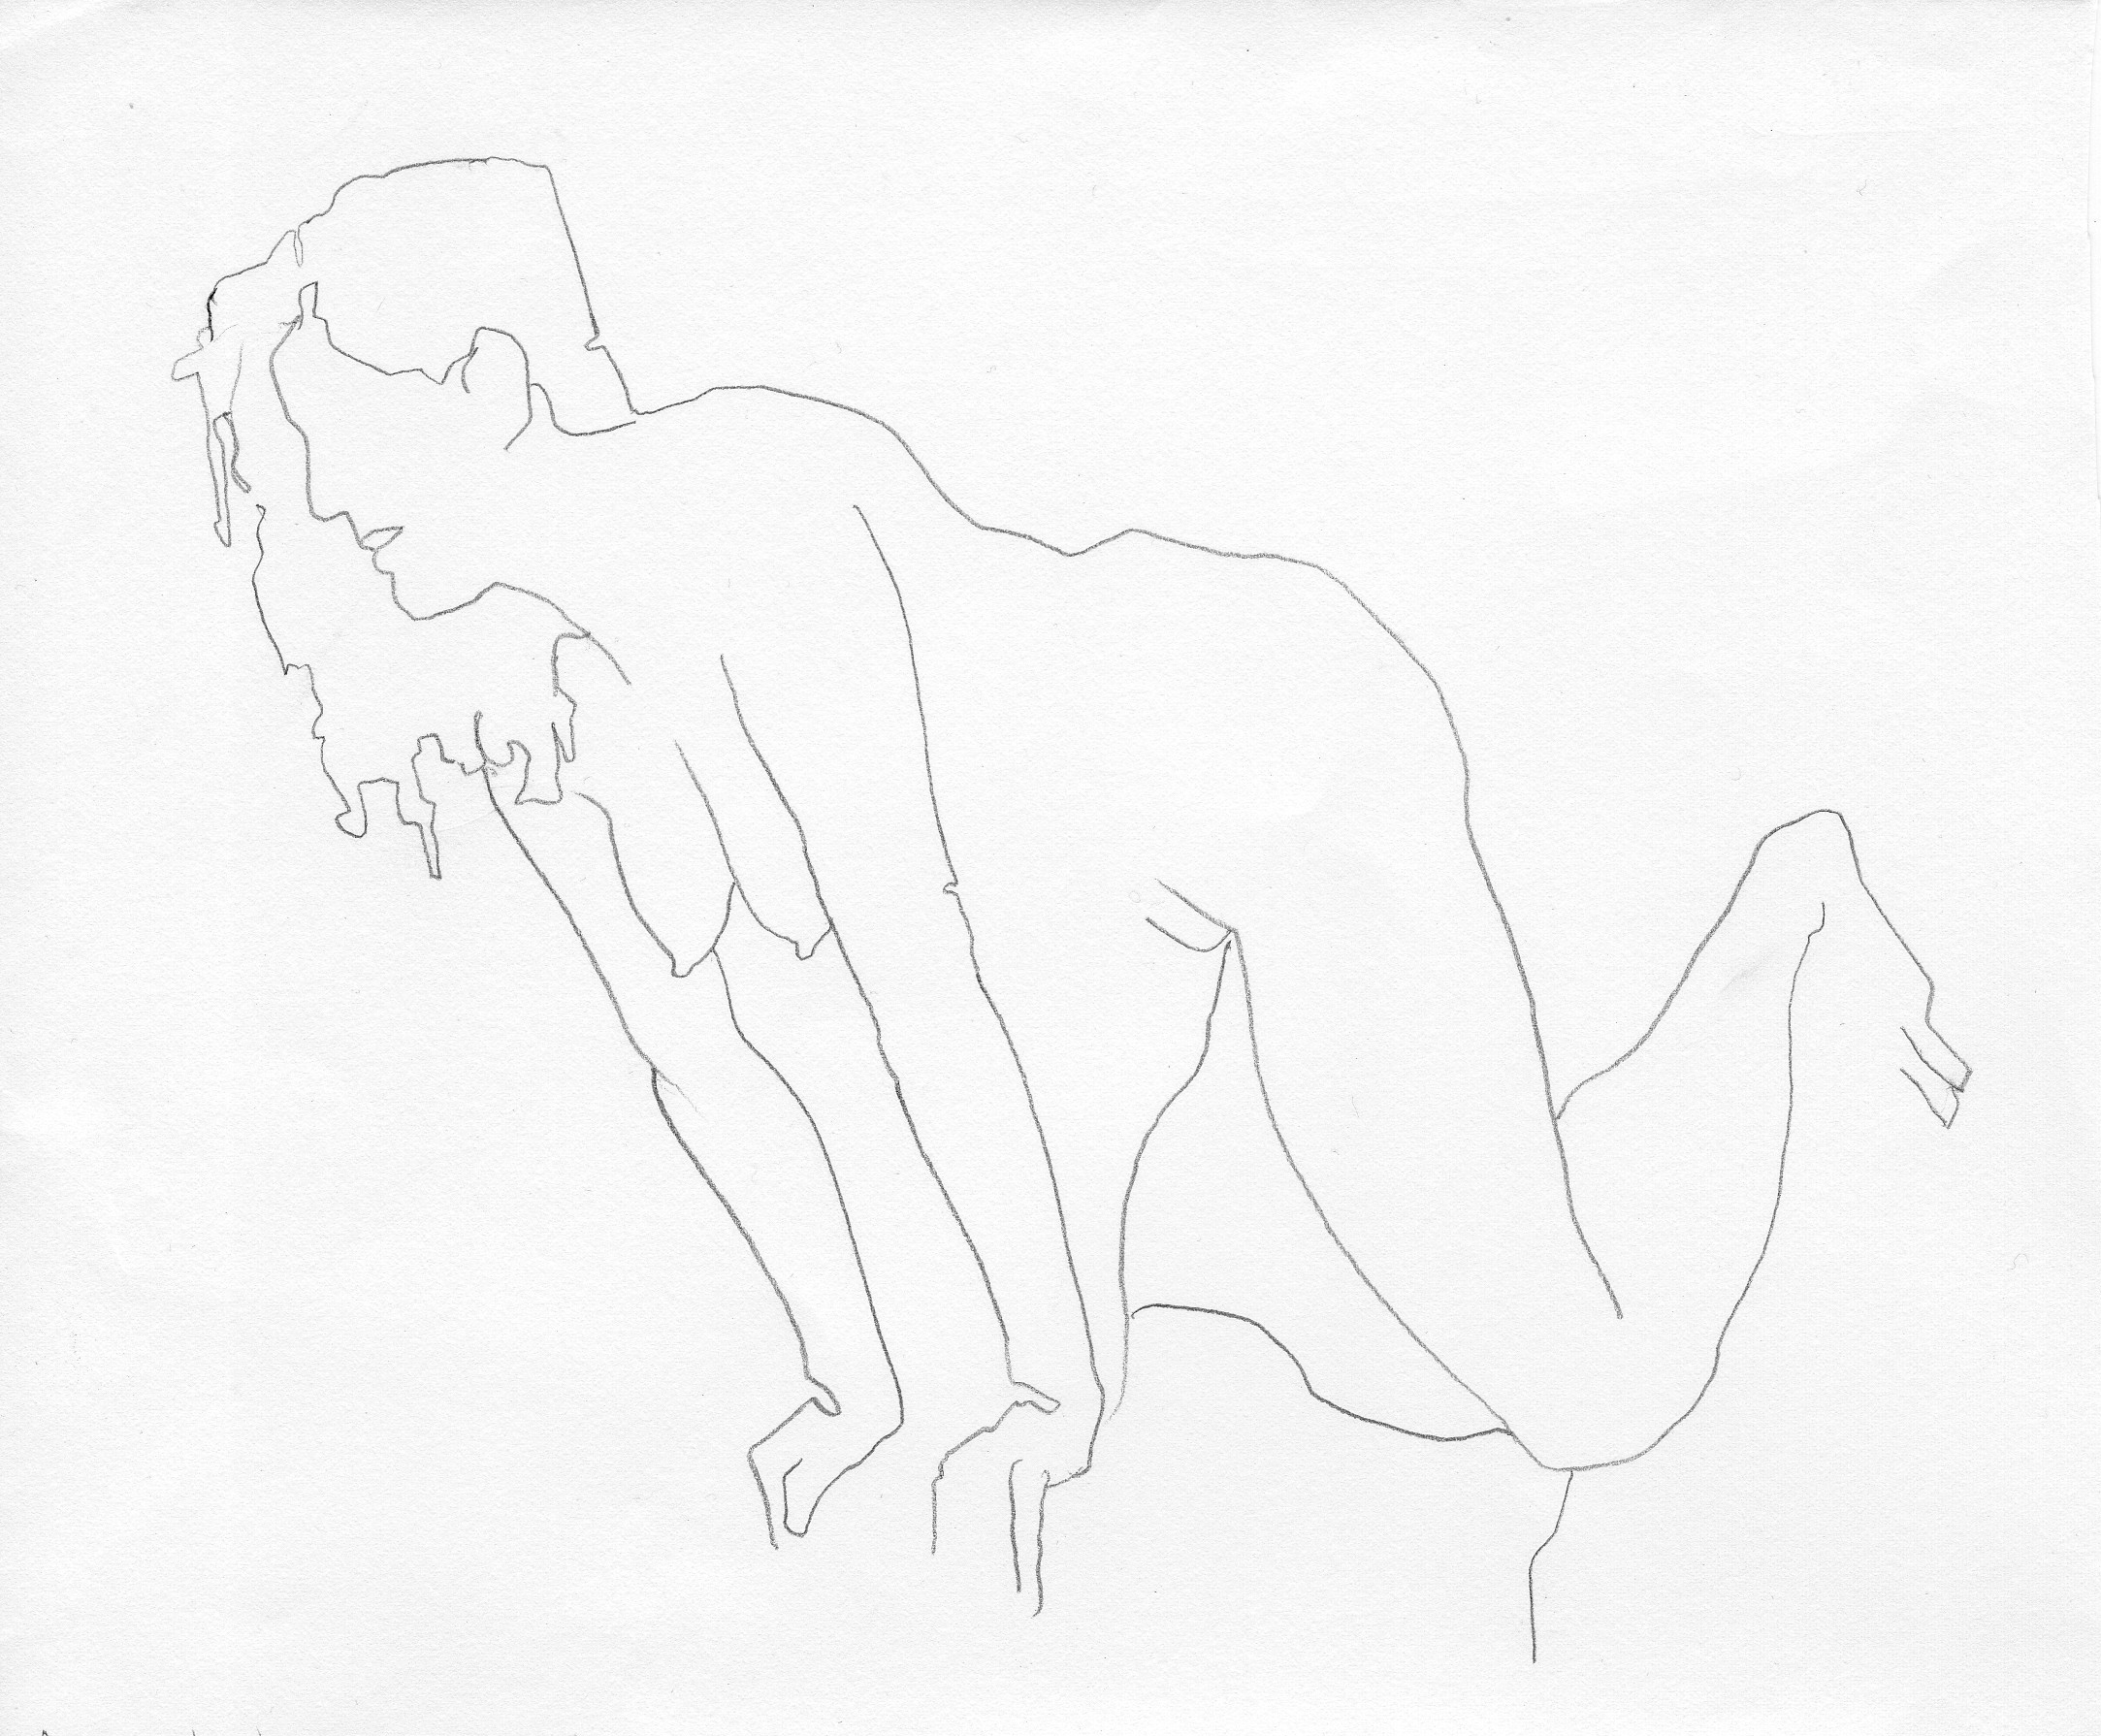 2016_Sketch_F-Beudin_Angelique_02